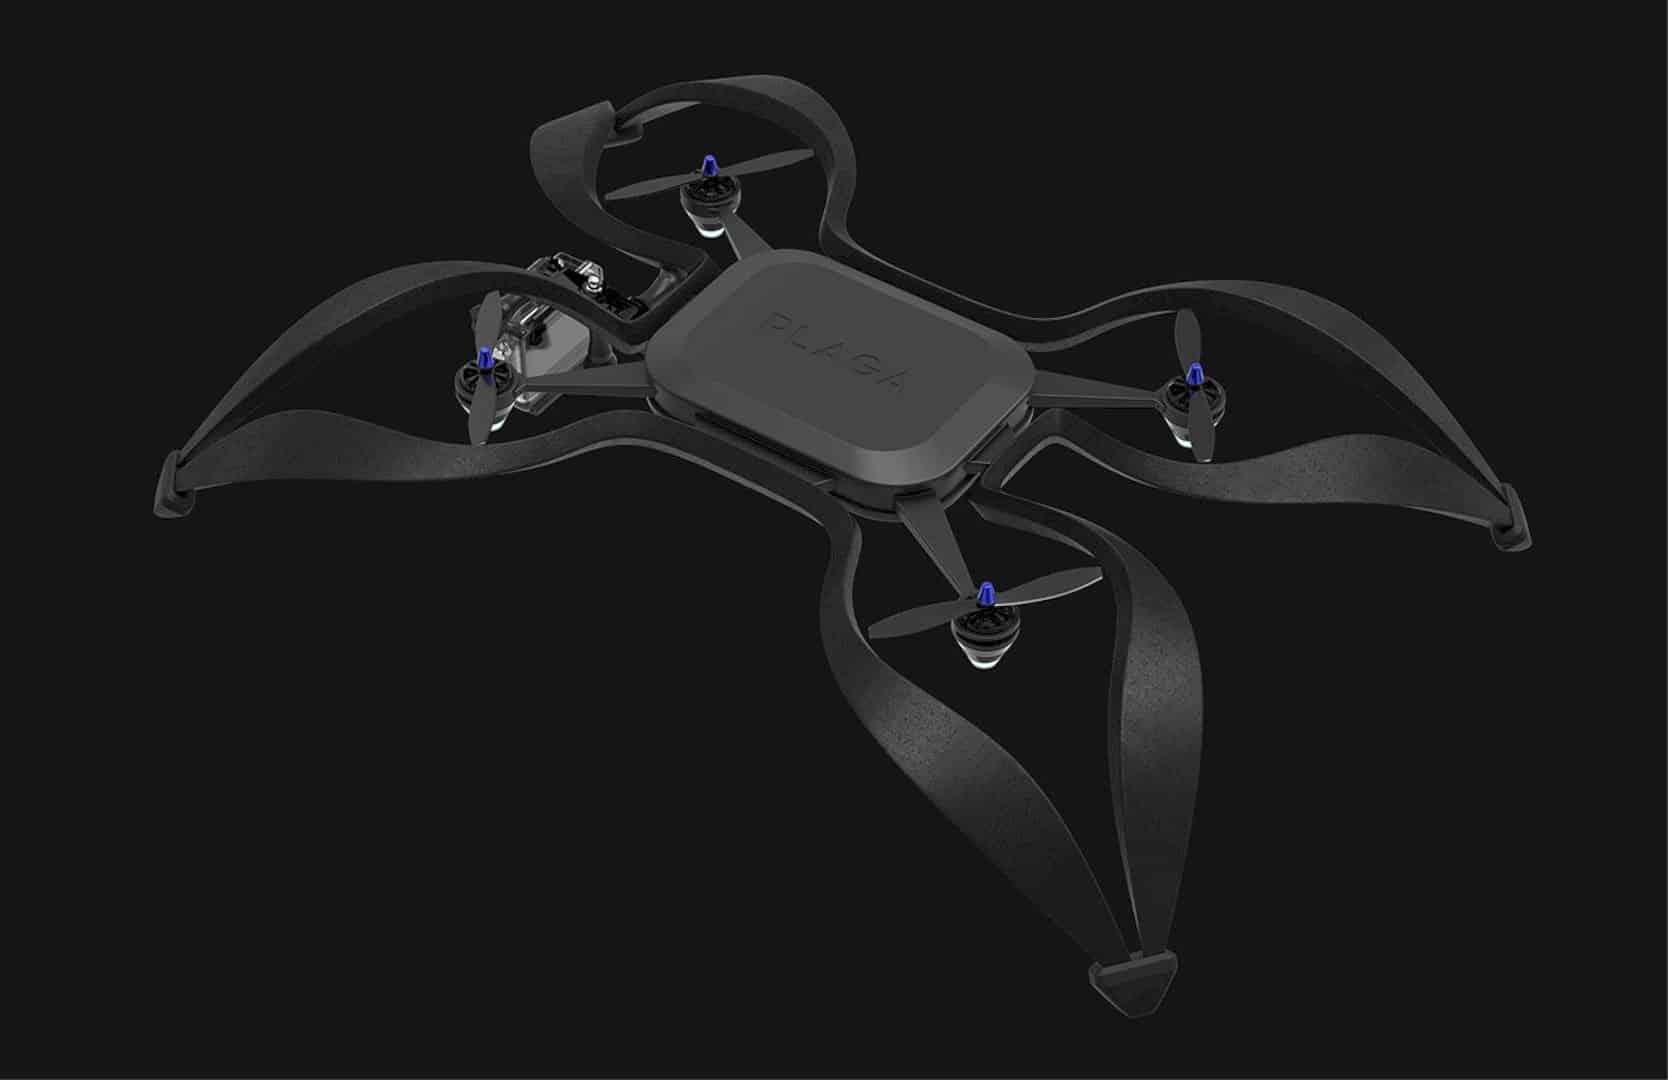 PLAGA Drone 8